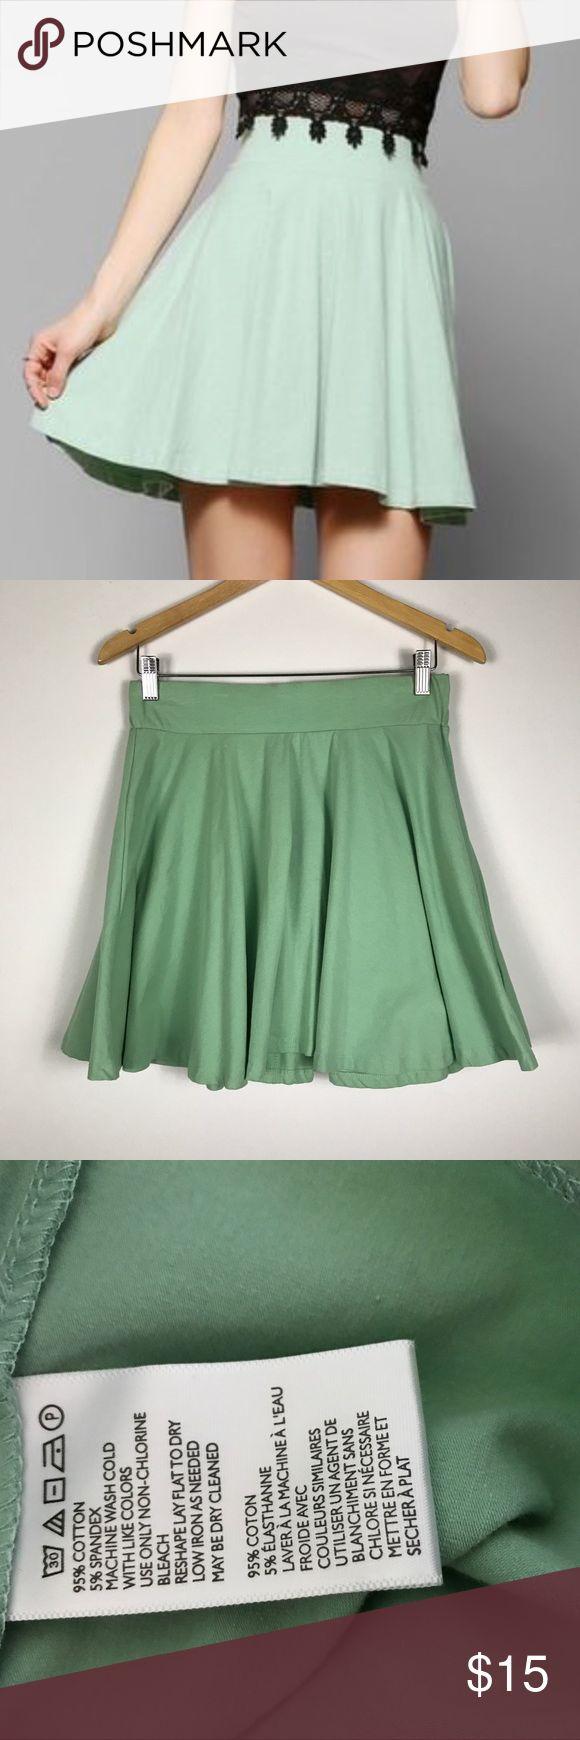 "Mint medium pins needles urban outfitters skirt Mint medium pins needles urban outfitters skirt. Elastic waist. Measures approx 14.5"" elastic waist 18""long laying flat Urban Outfitters Skirts Circle & Skater"